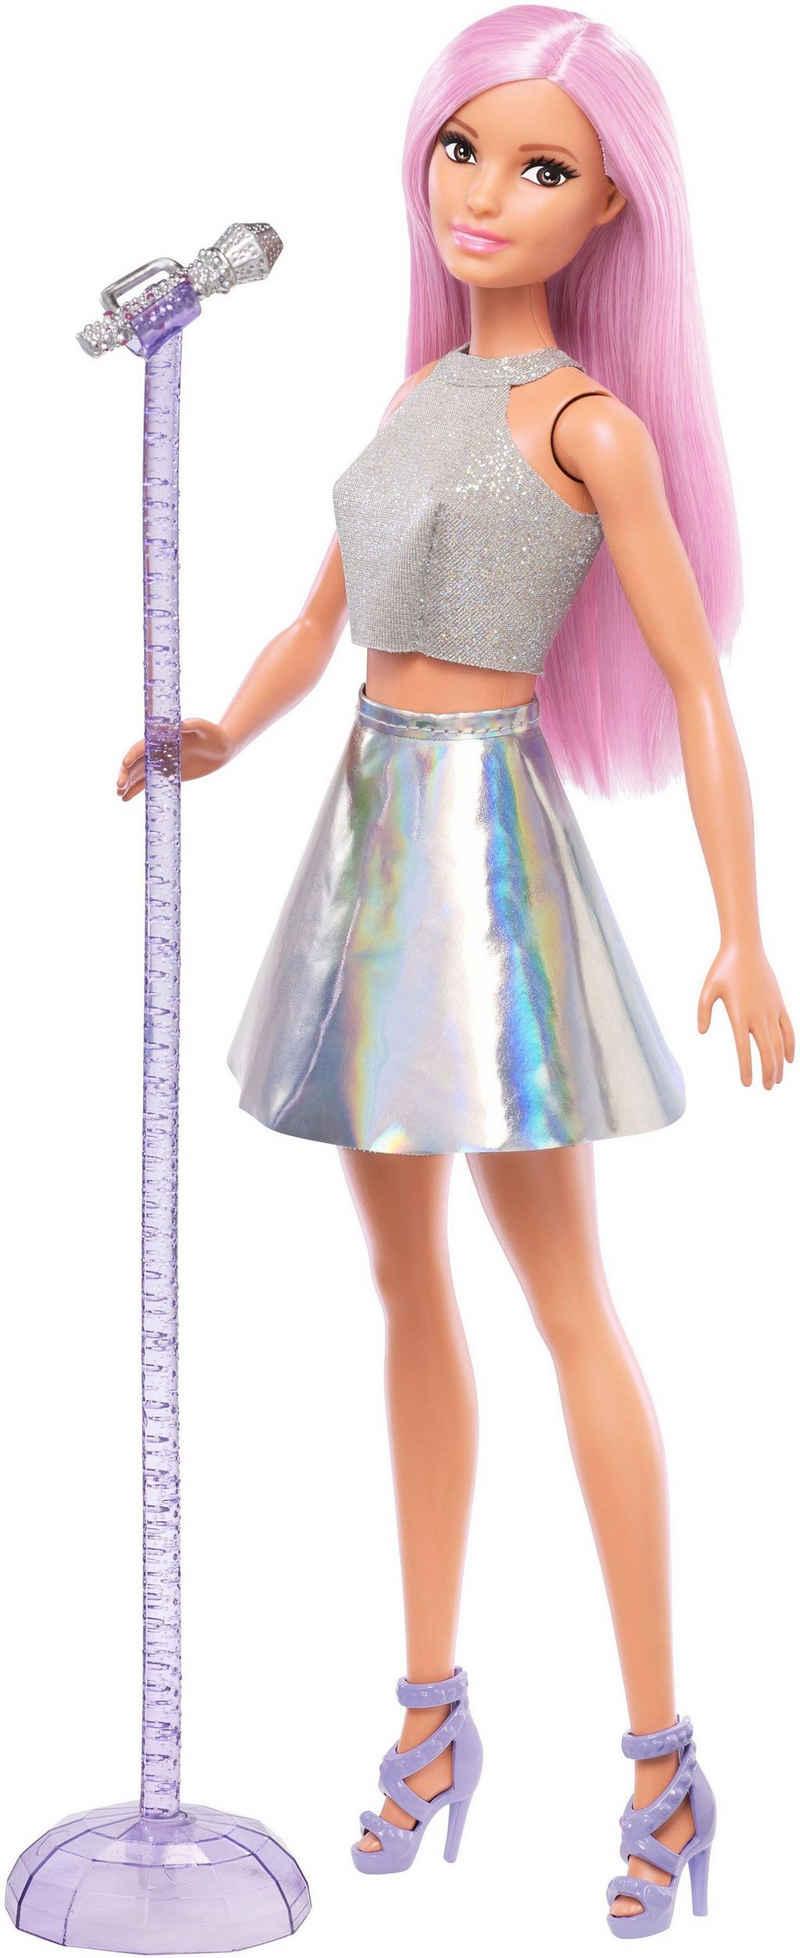 Barbie Anziehpuppe »Sängerin Puppe, pinke Haare«